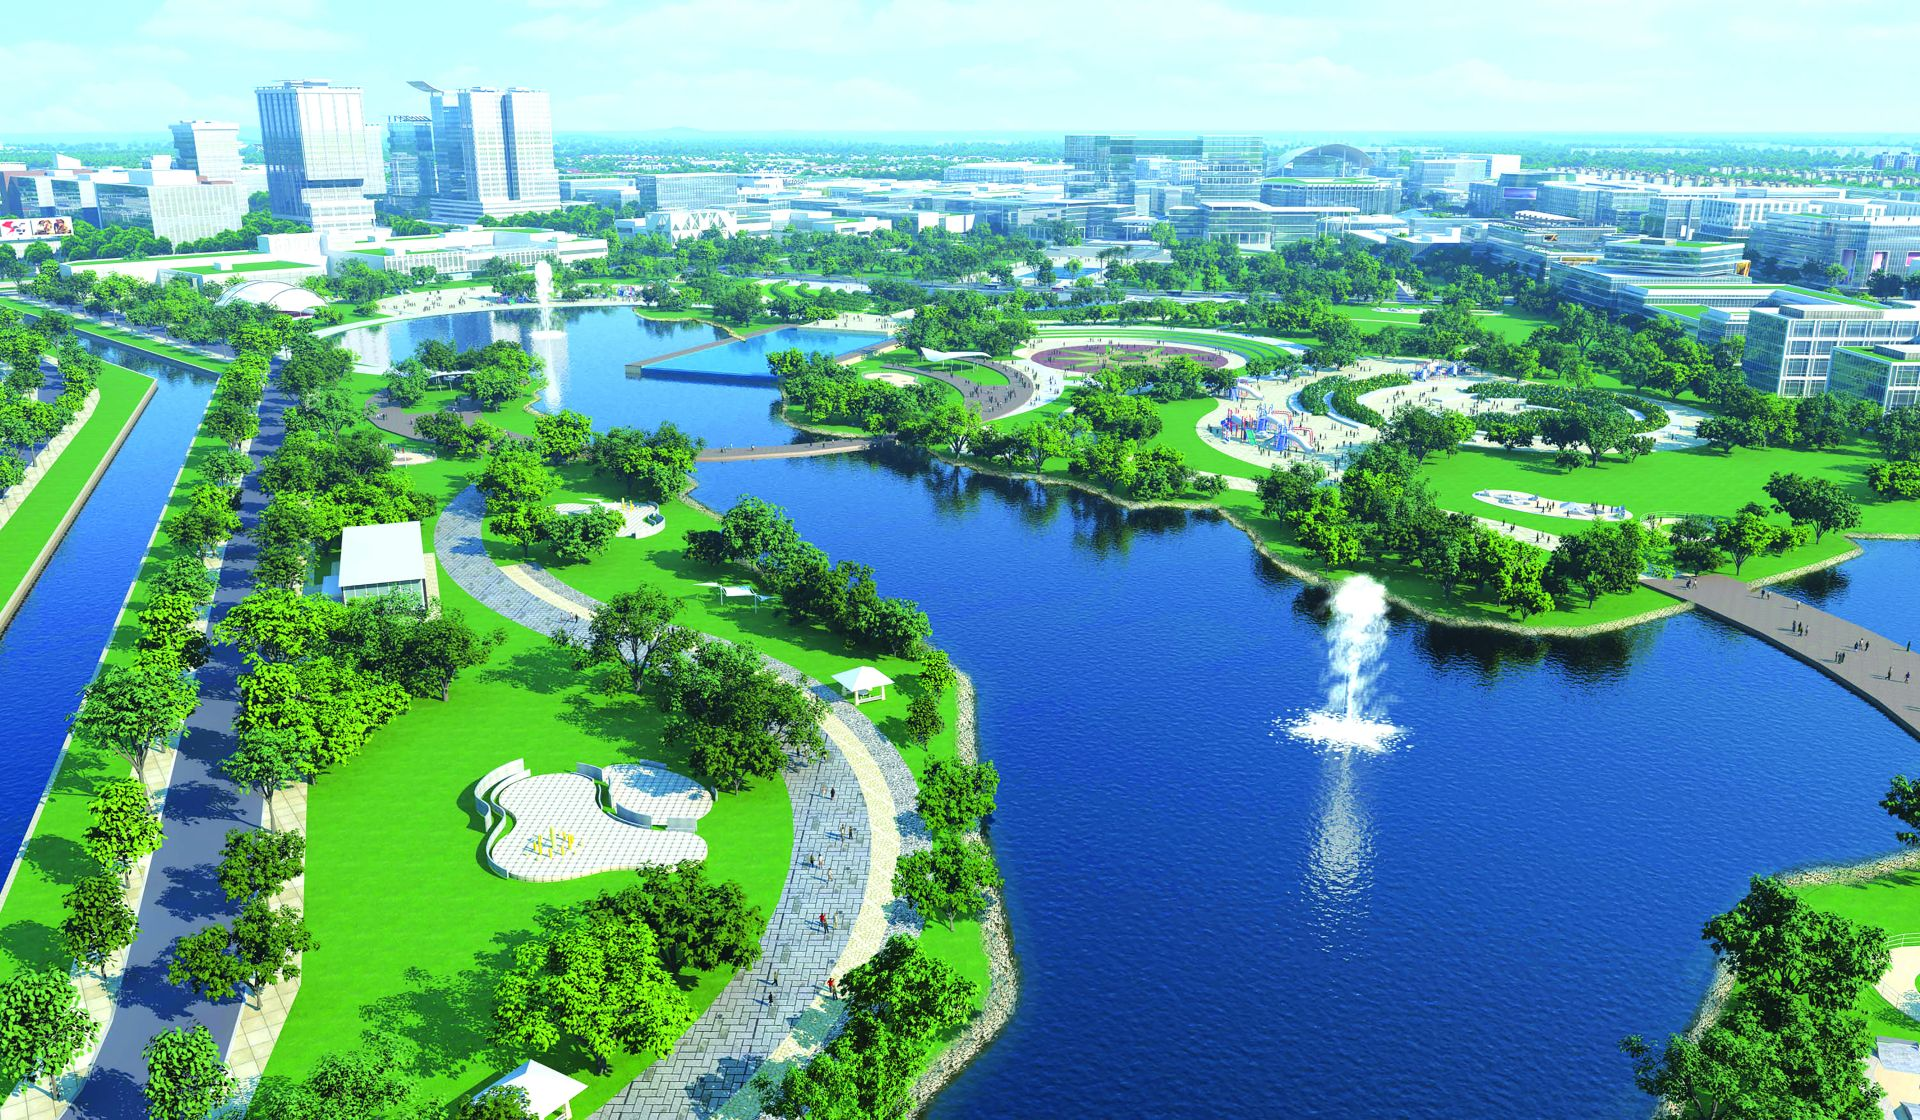 Binh Duong New City, By Michael Halloran